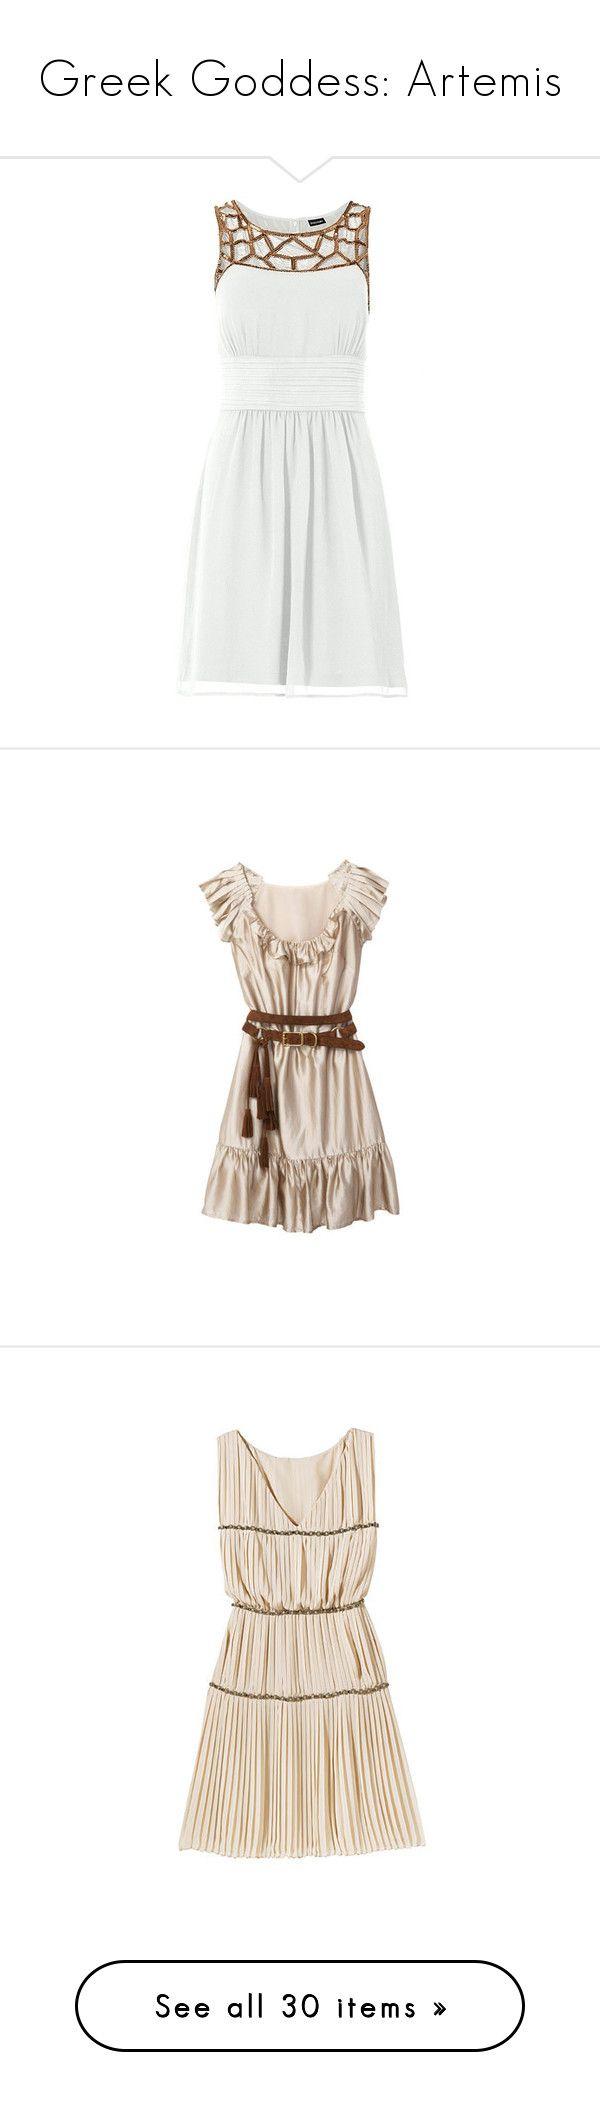 """Greek Goddess: Artemis"" by storycosmicjasmine ❤ liked on Polyvore featuring dresses, vestidos, robes, white dress, white day dress, short dresses, tops, haljine, alberta ferretti and silk dress"